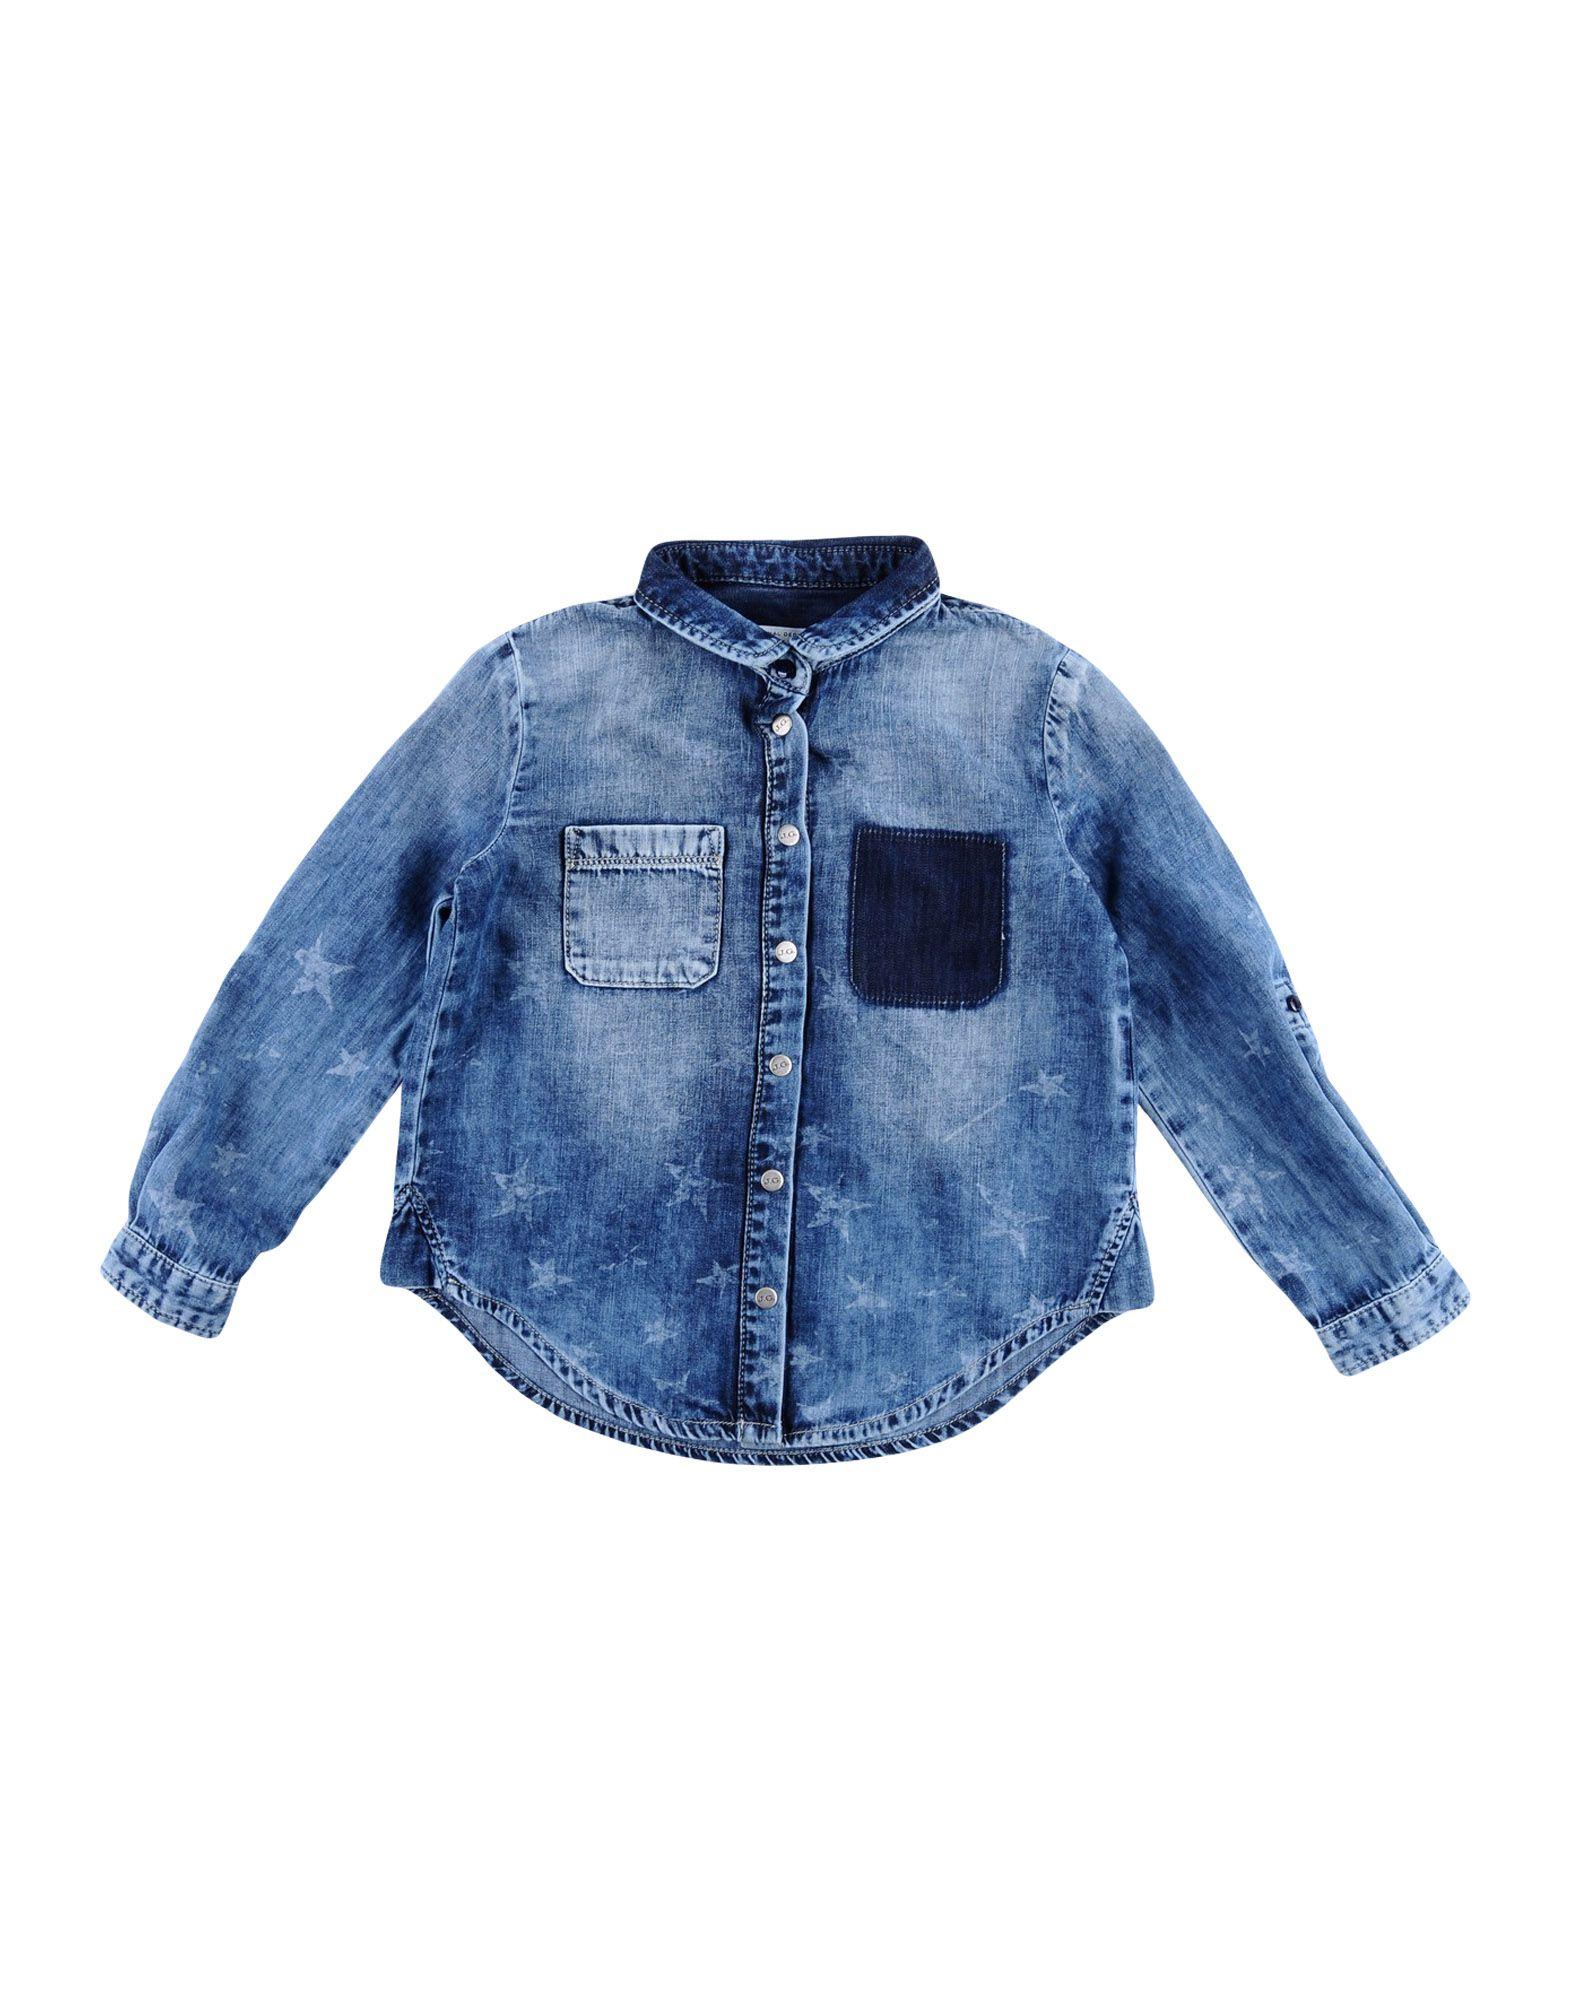 JOHN GALLIANO KIDS Джинсовая рубашка john galliano kids 325816